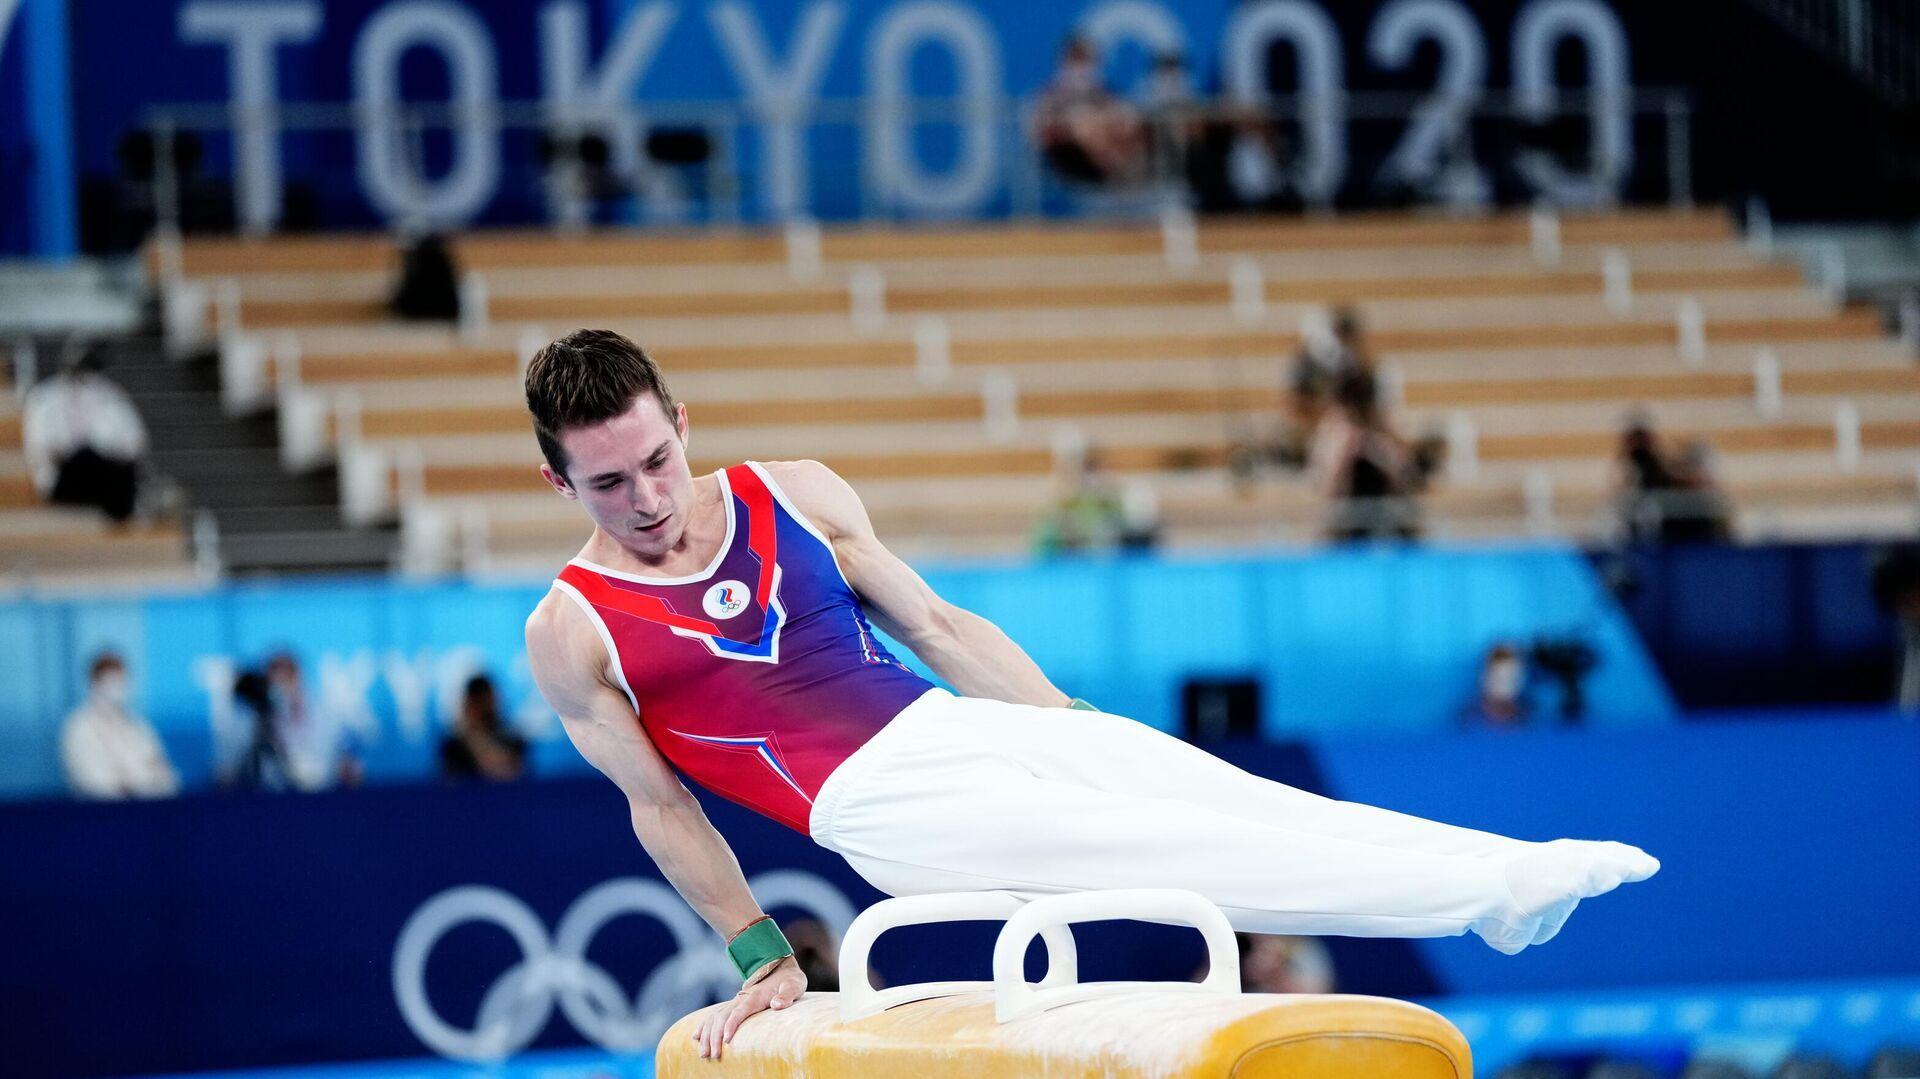 Олимпиада-2020. Спортивная гимнастика. Мужчины. Конь - РИА Новости, 1920, 01.08.2021